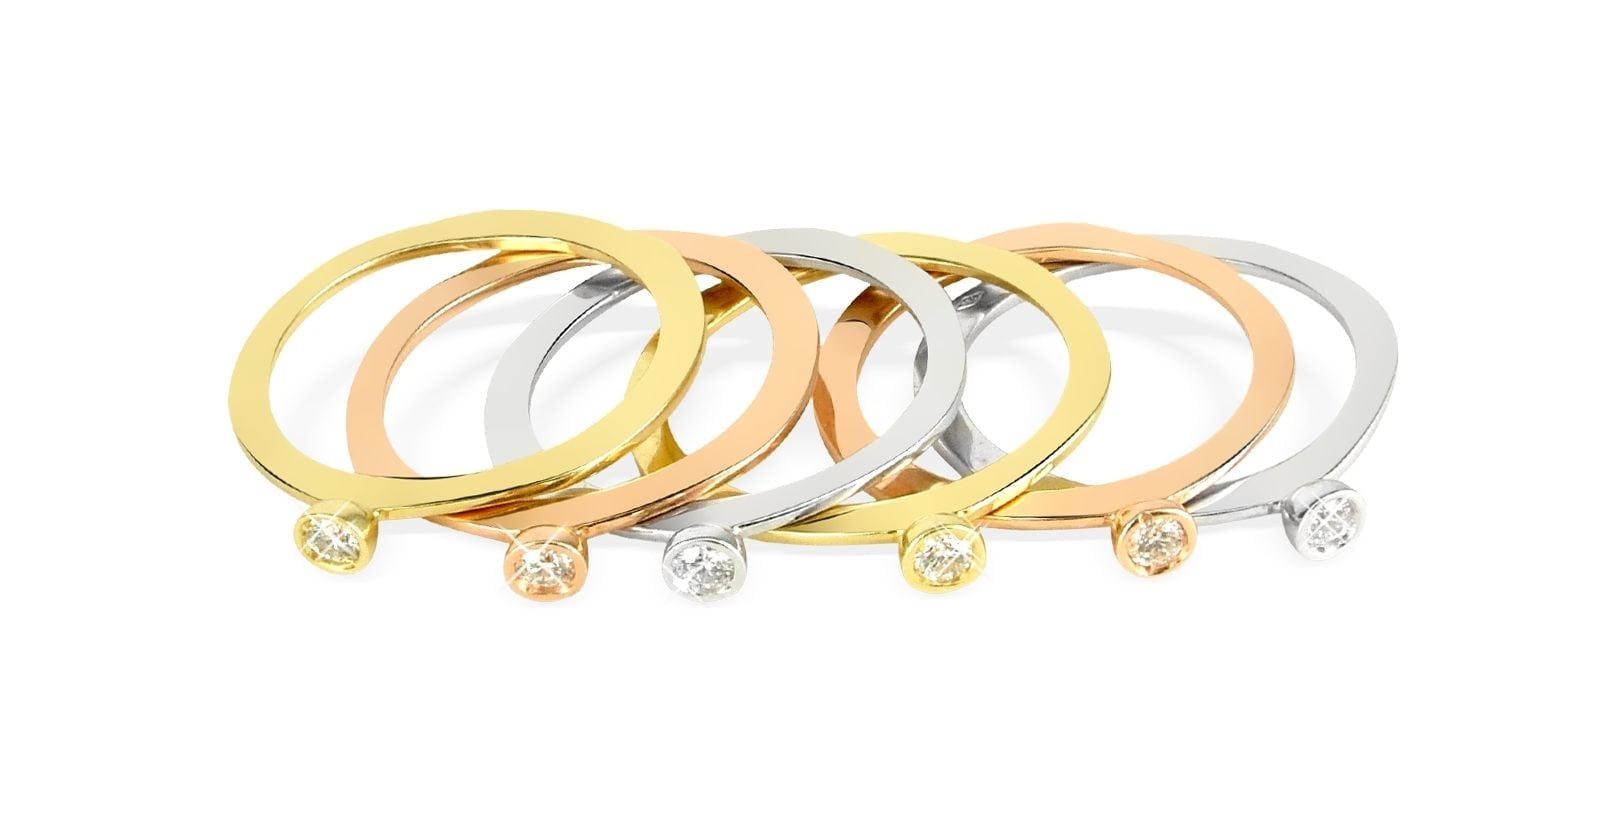 torrini gold bezelset diamond threetone 18k gold stackable ring set of six product 3 9954336 012497651 e1489146093414 - Torrini - Cei mai vechi făuritori de comori ai Florenței